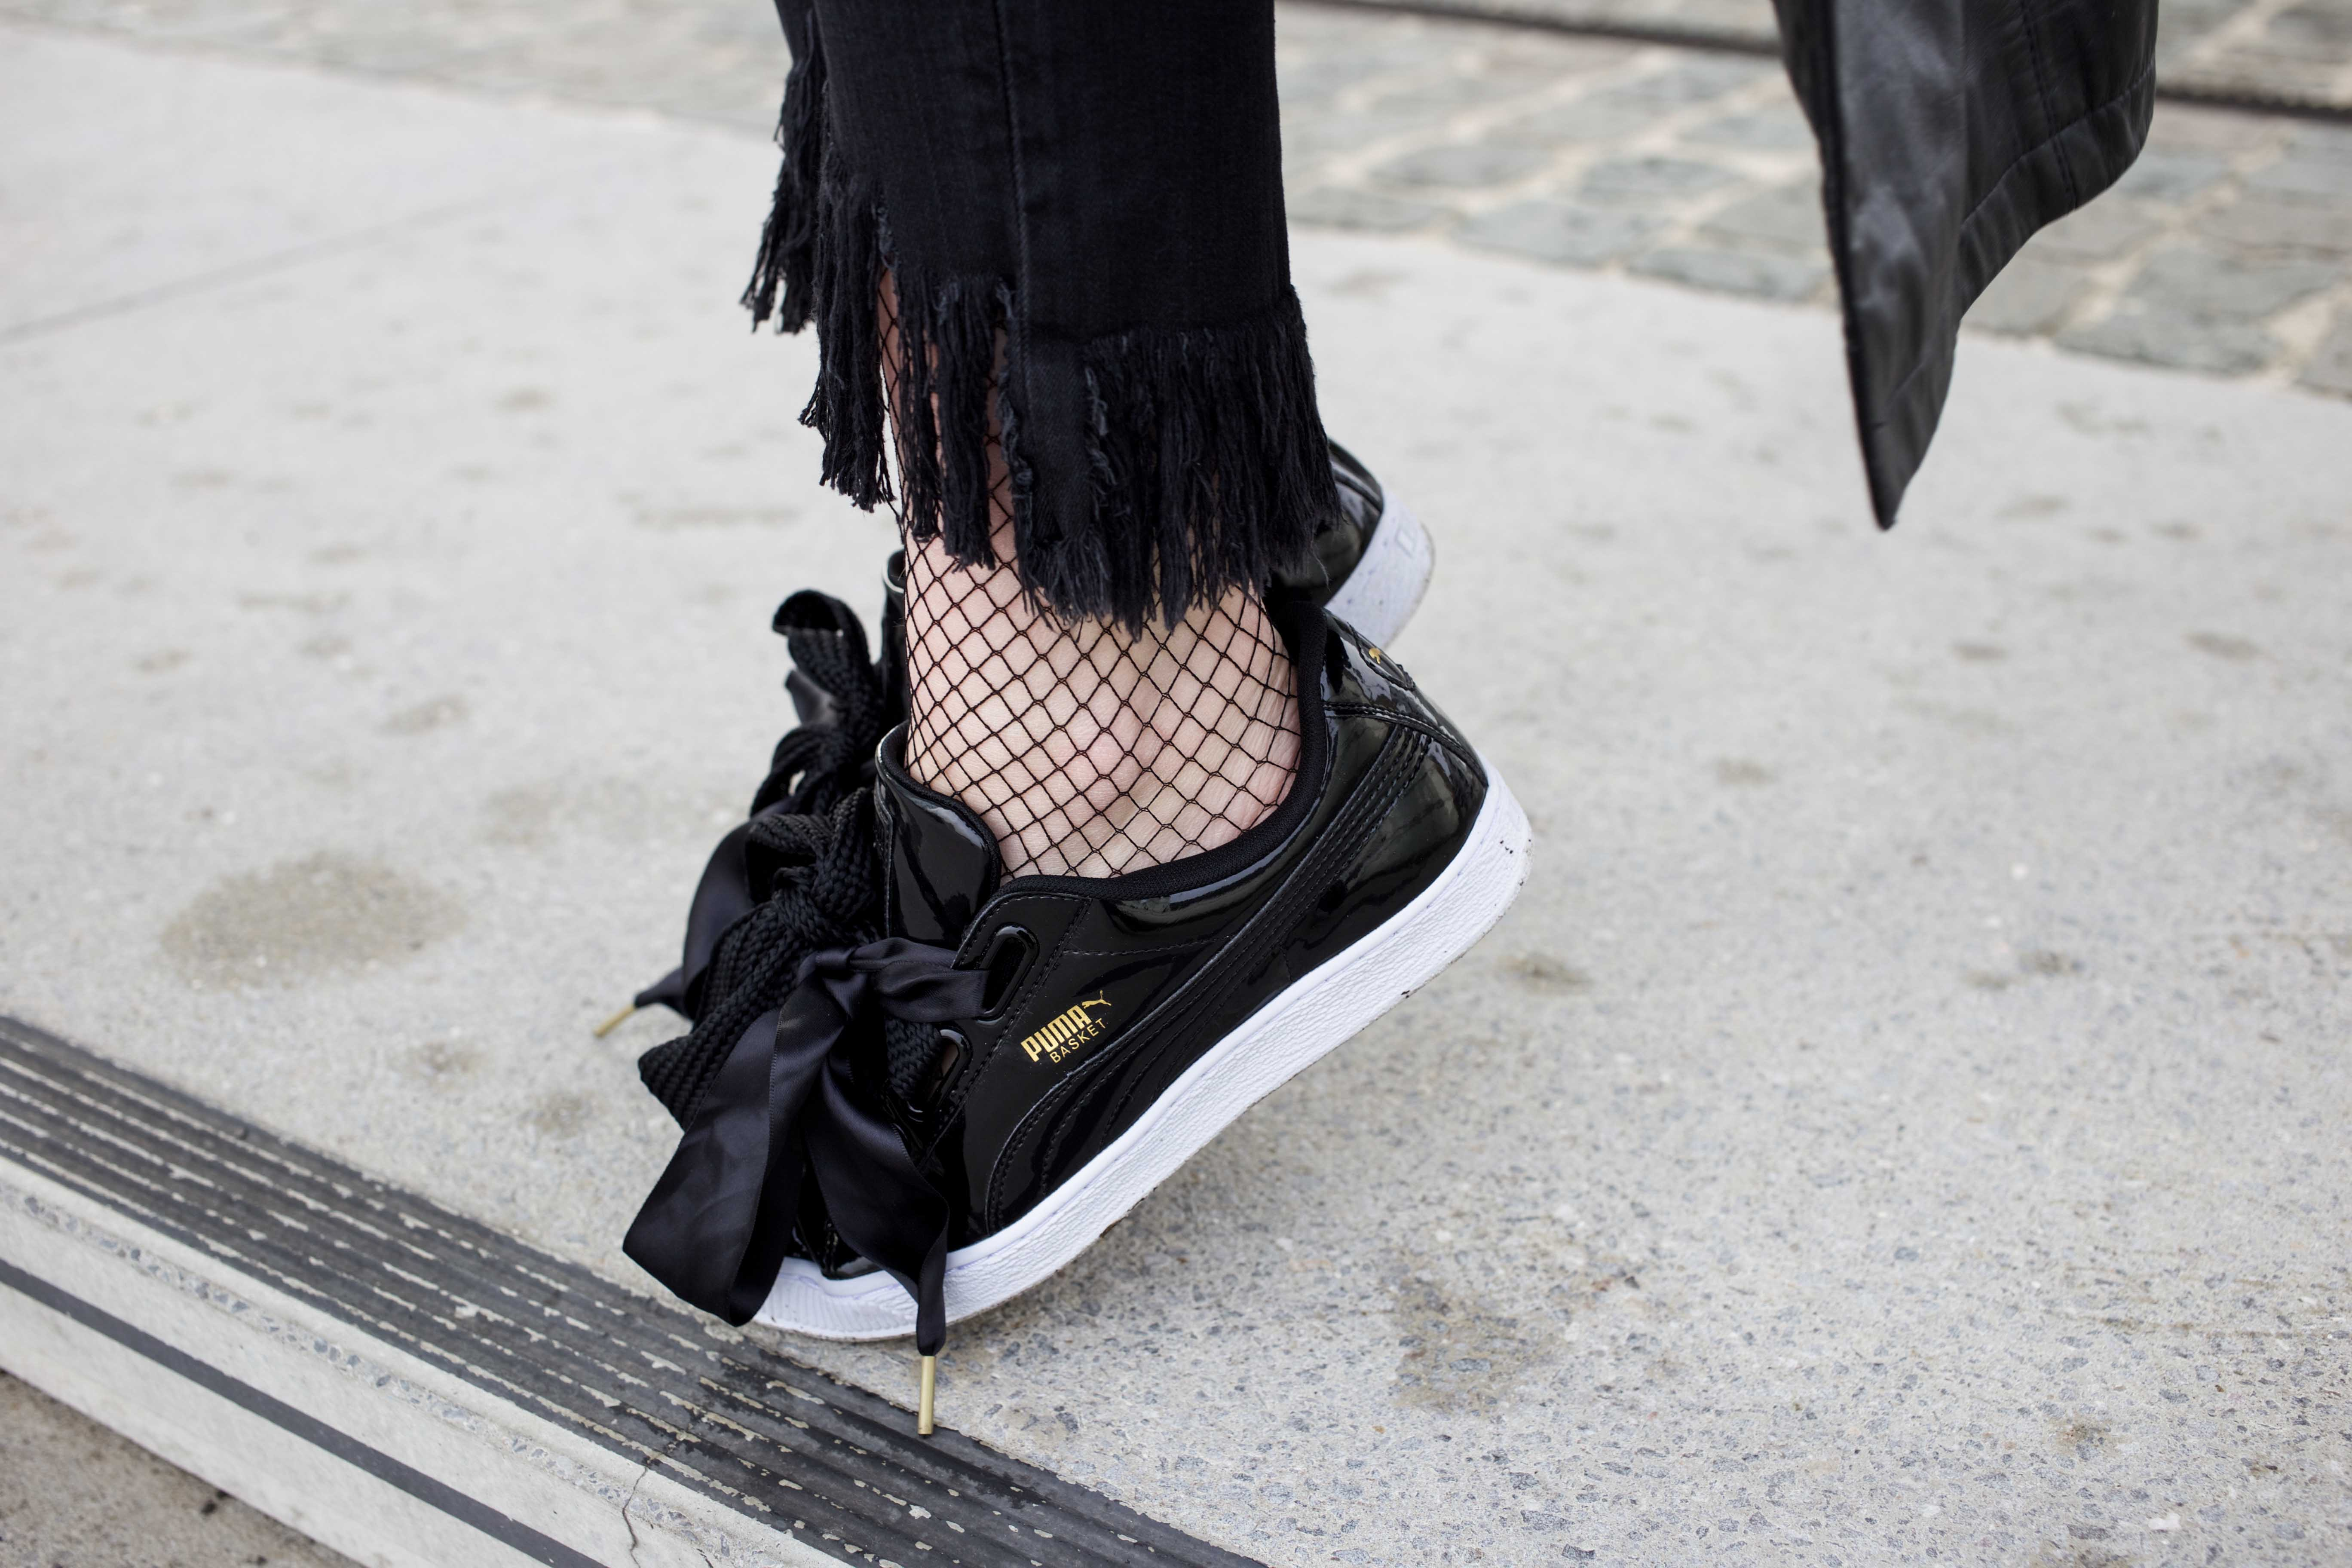 Netzstrumpfhose-kombinieren-Trend-Outfit-Fashionblog-PUMA-Basket-Ledermante_9507